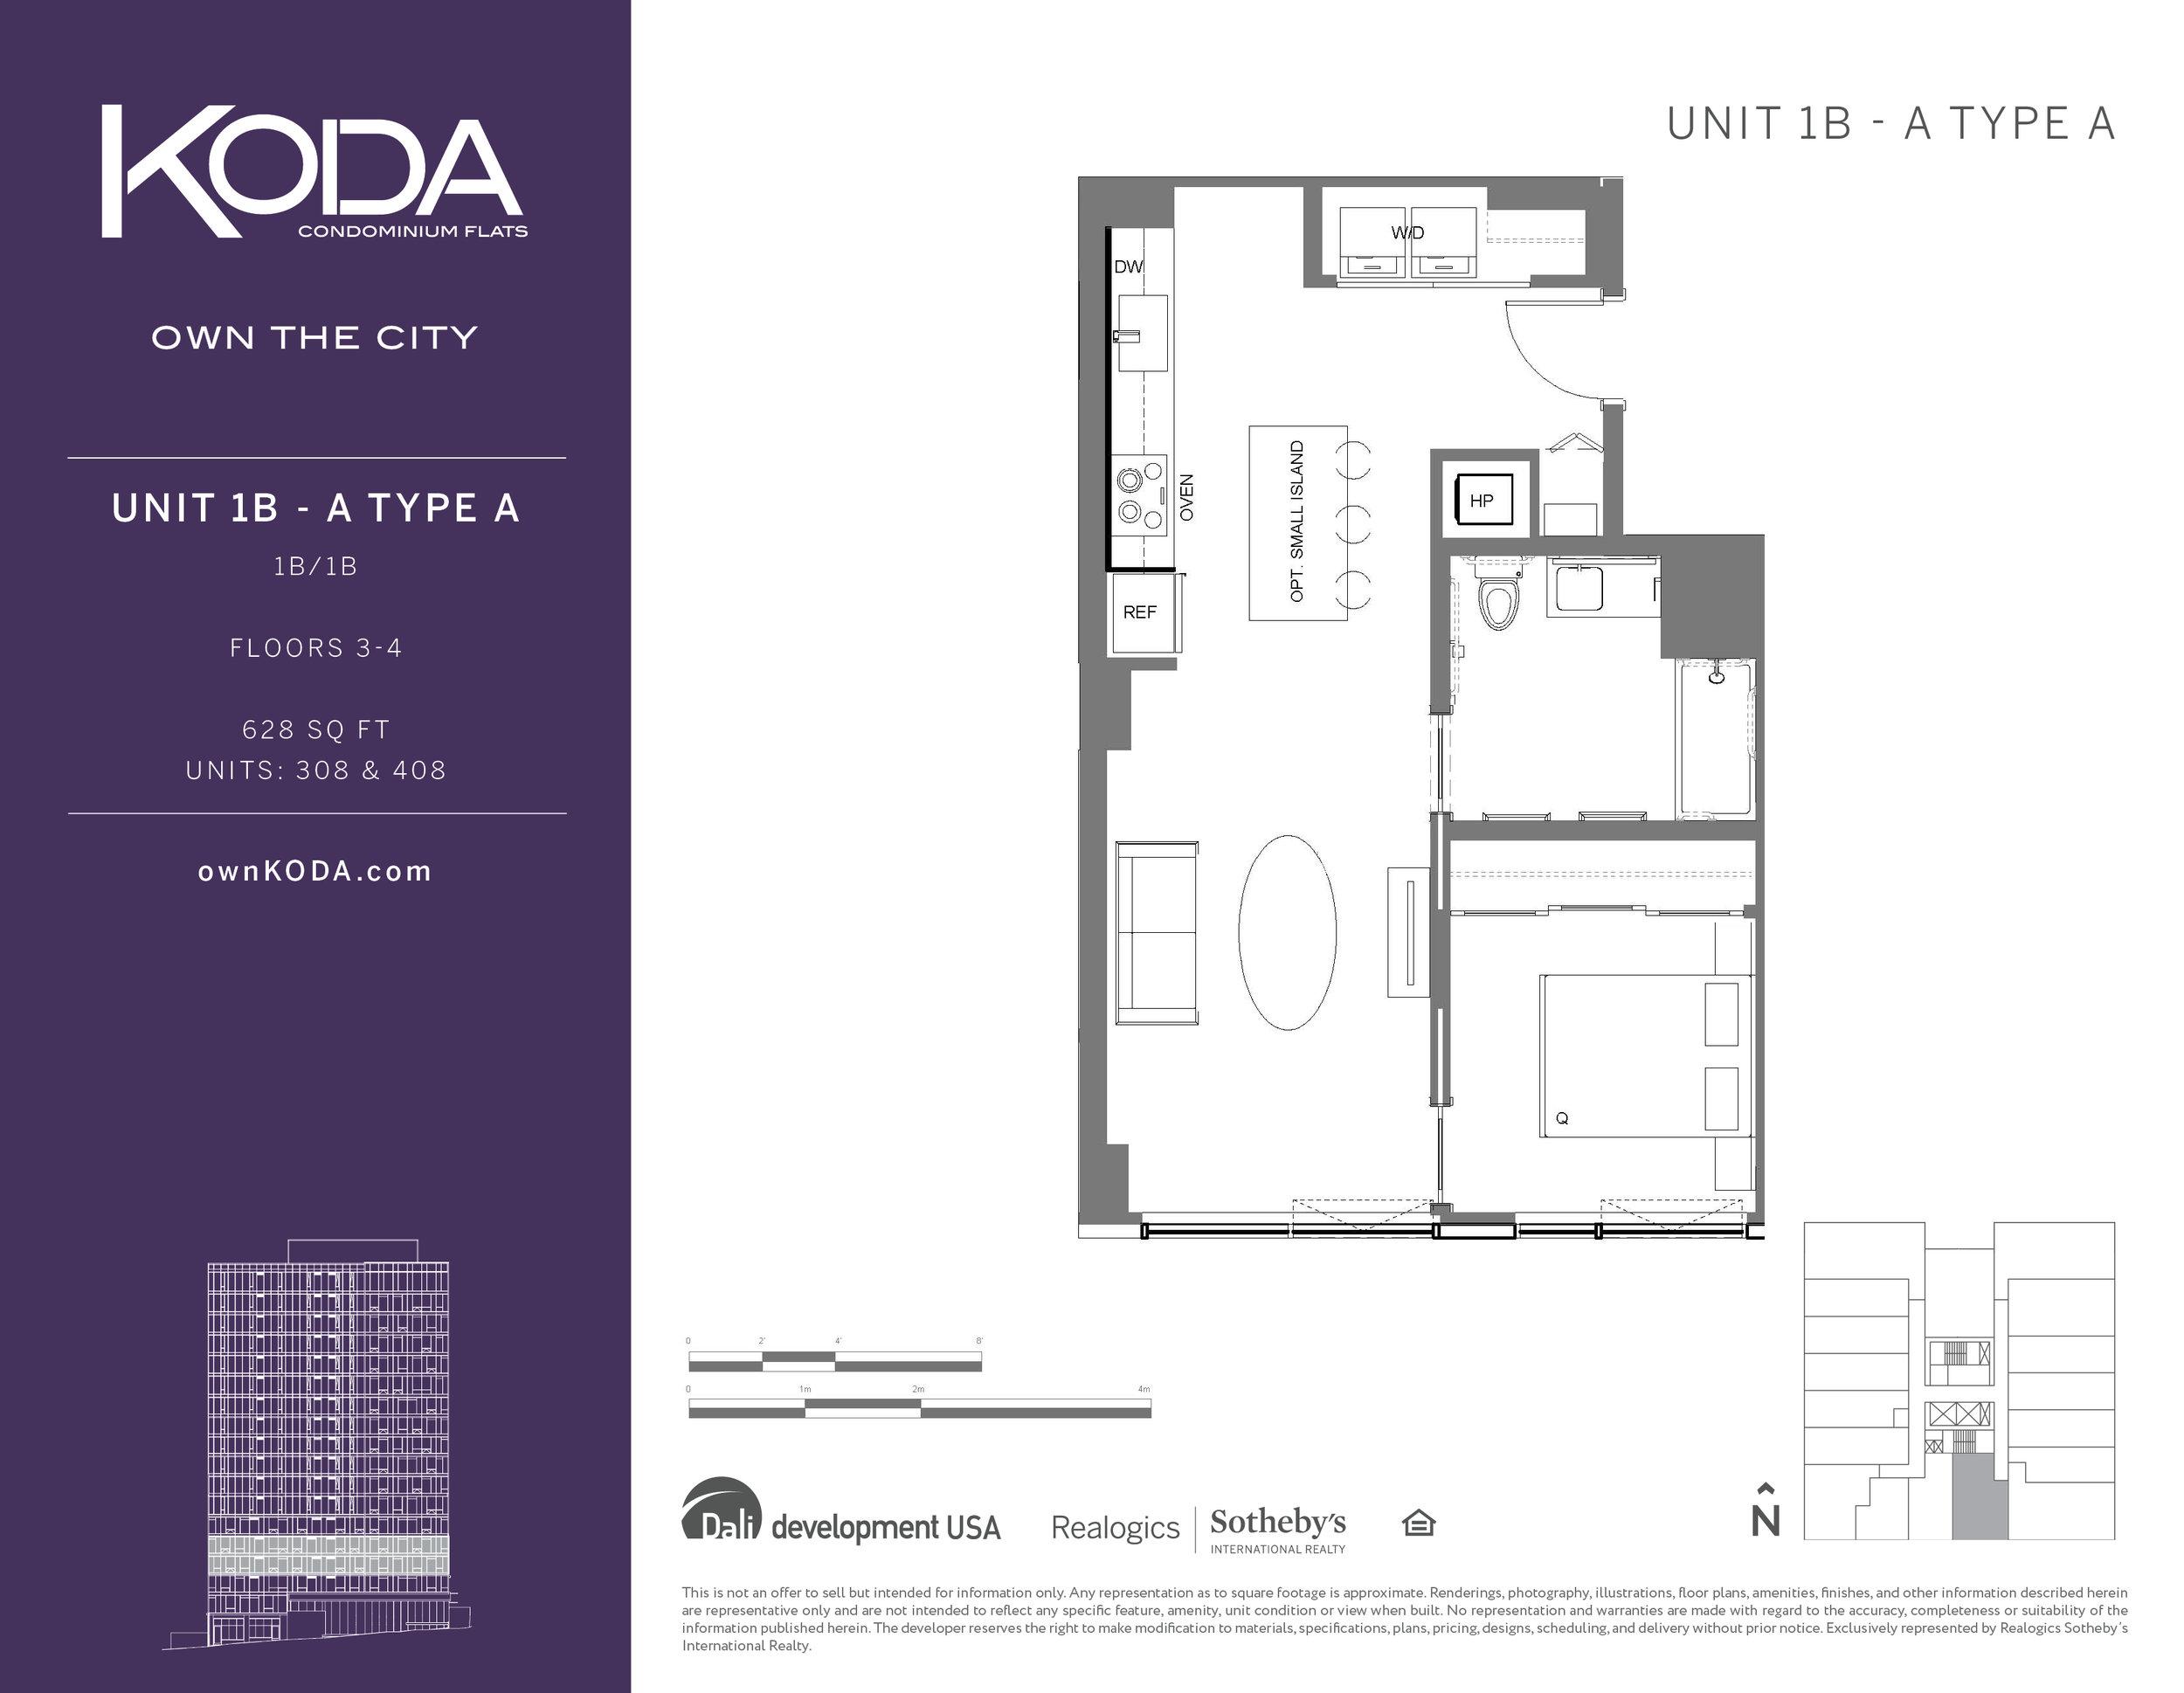 KODA_FloorPlanFlyer_Update_Approved_04.04.19_Release23.jpg